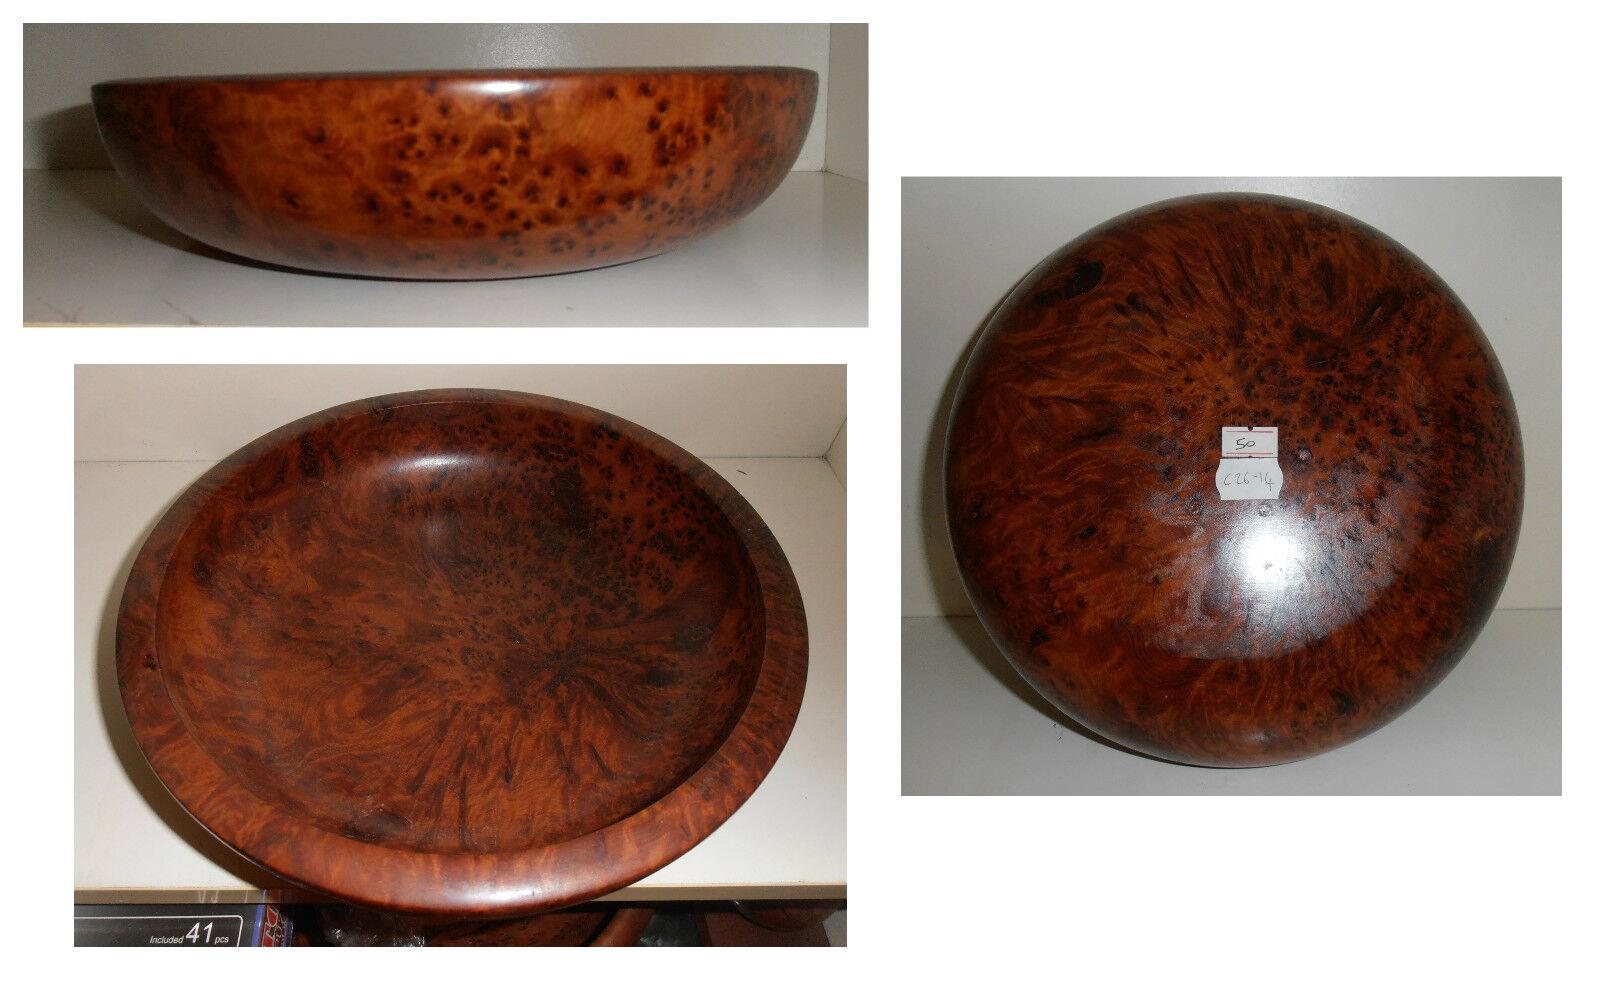 Ciotola cm 26 radica, legno radice tuya tuja tuia, artigianato africano, C26-14